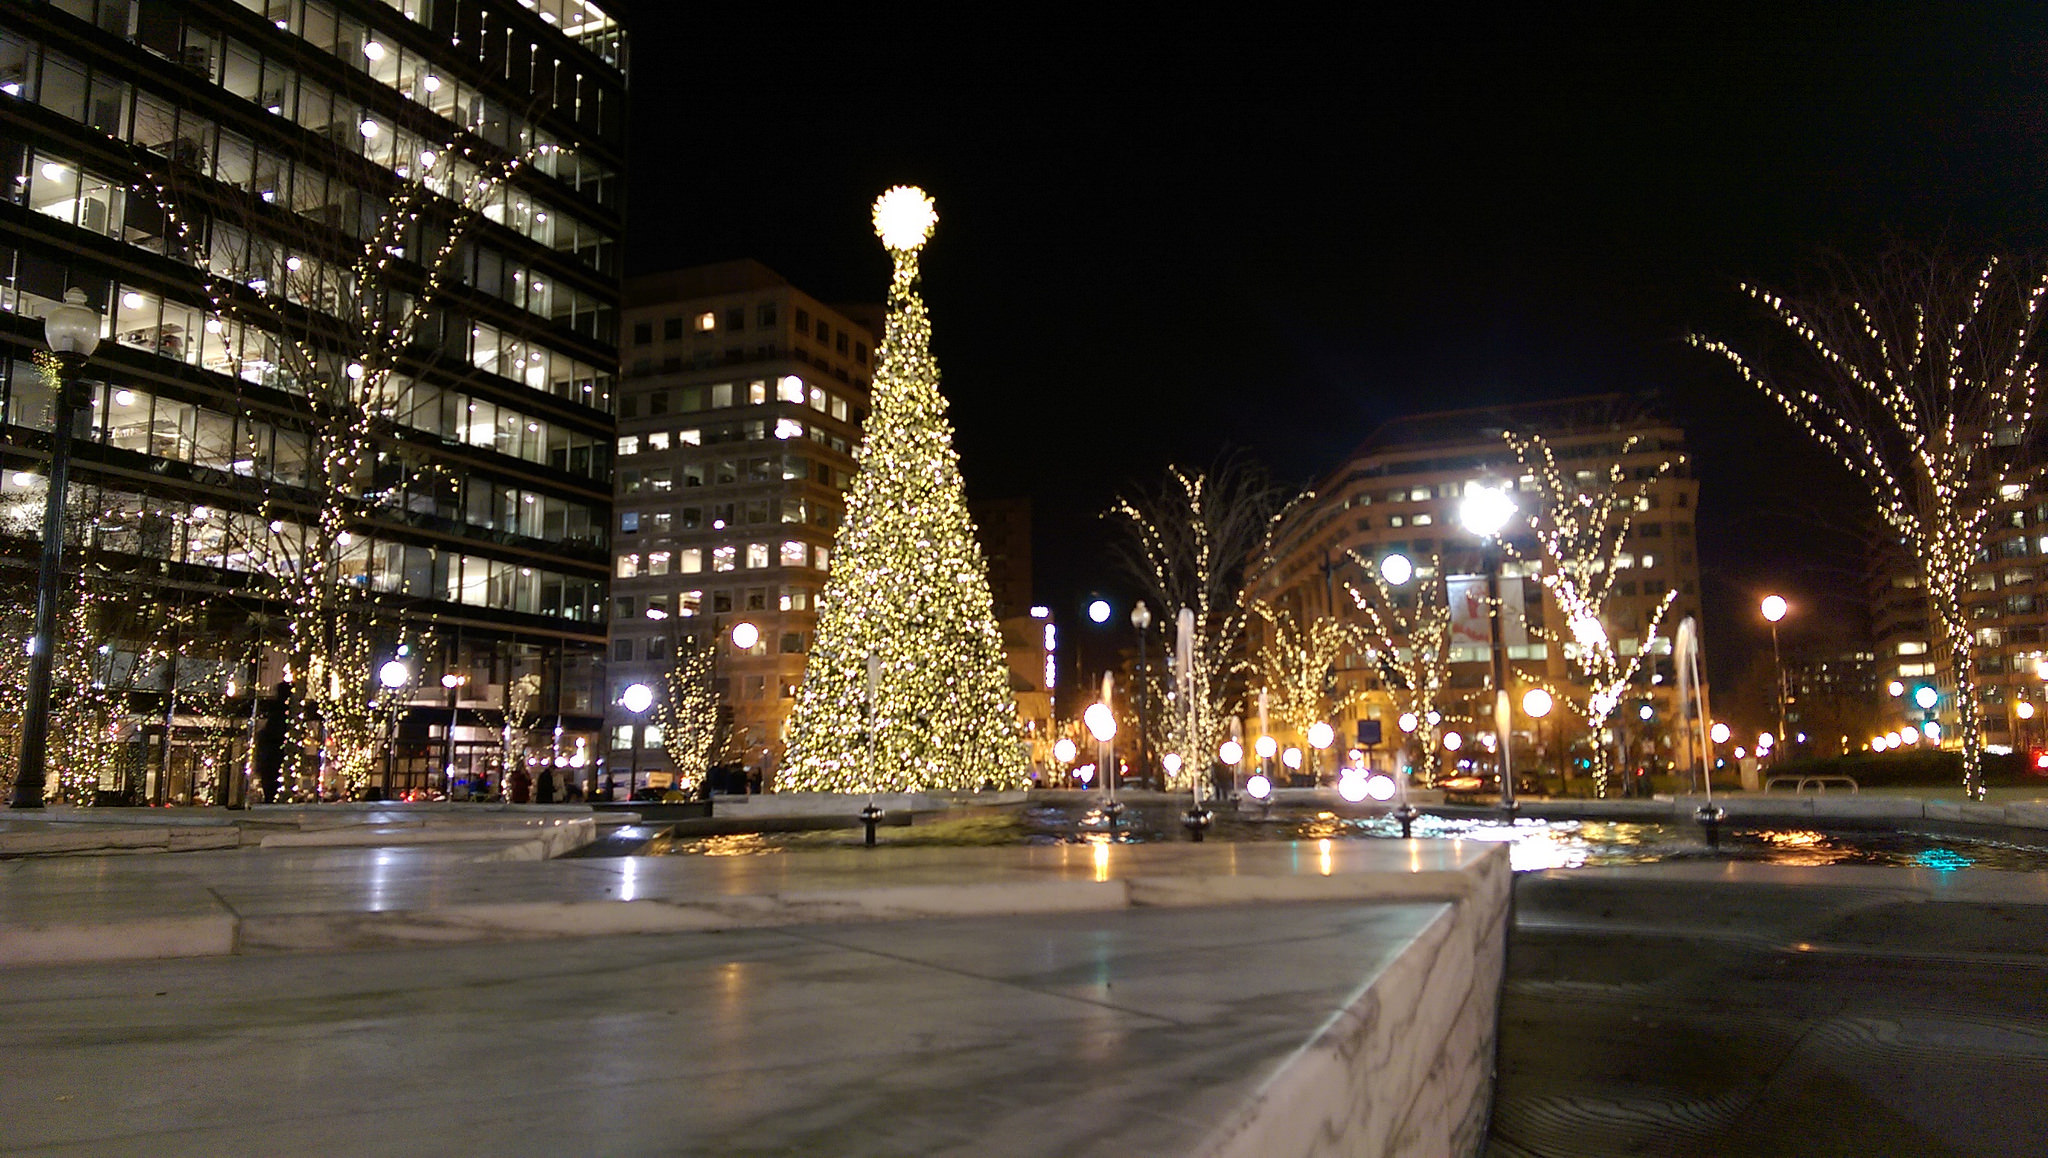 Christmas Lights in Washington DC, United States. Flickr - Kelvin Flores.